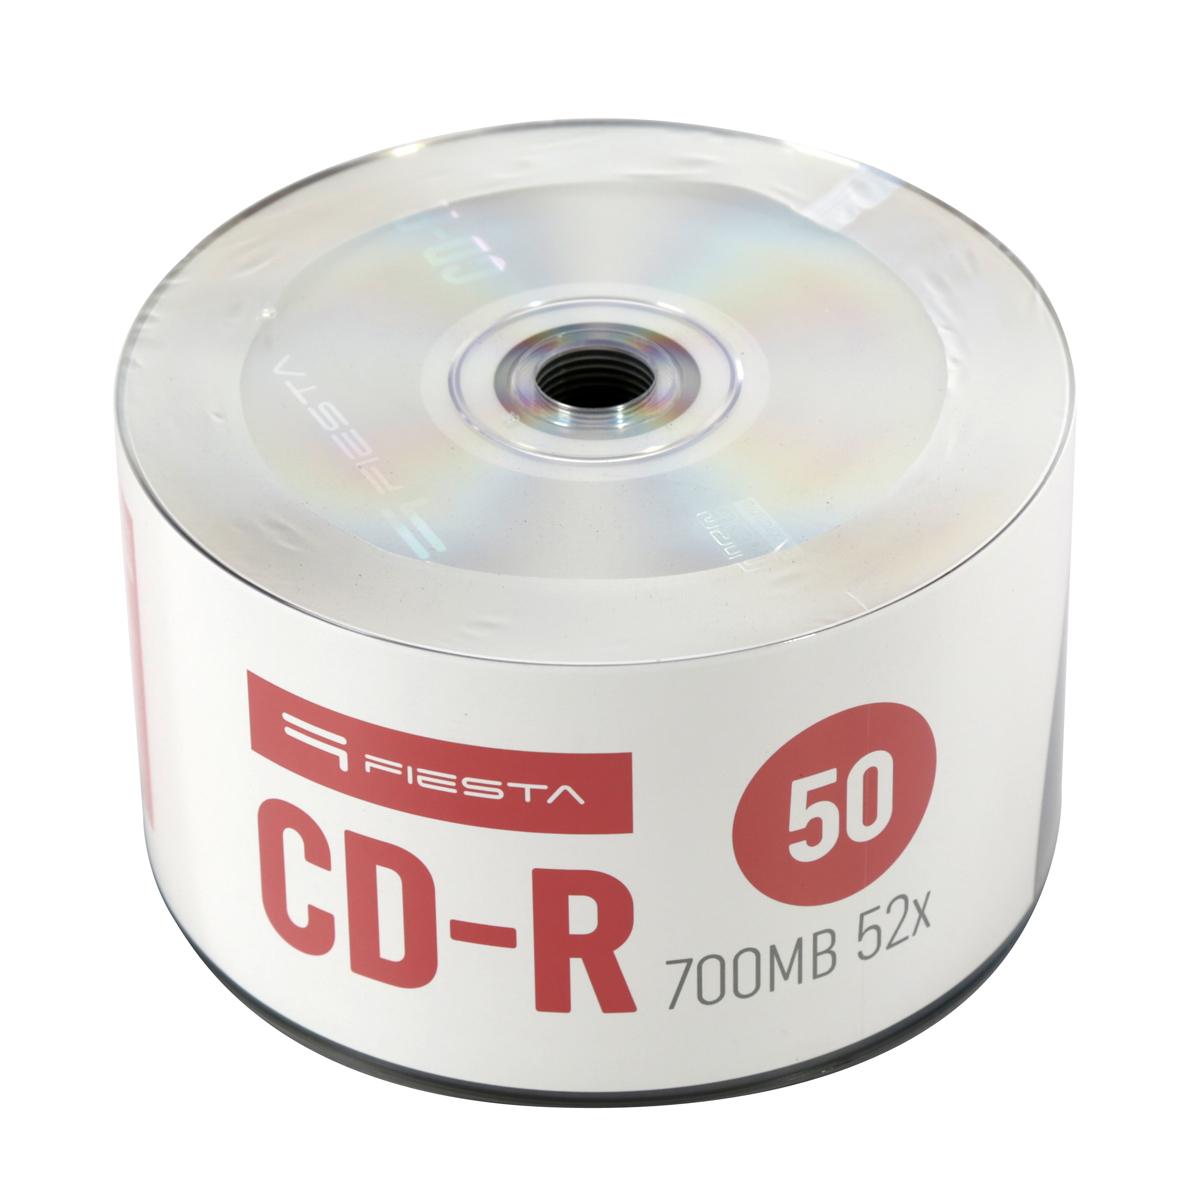 CD-R 700MB  50бр. Шпиндел FIESTA (52x )